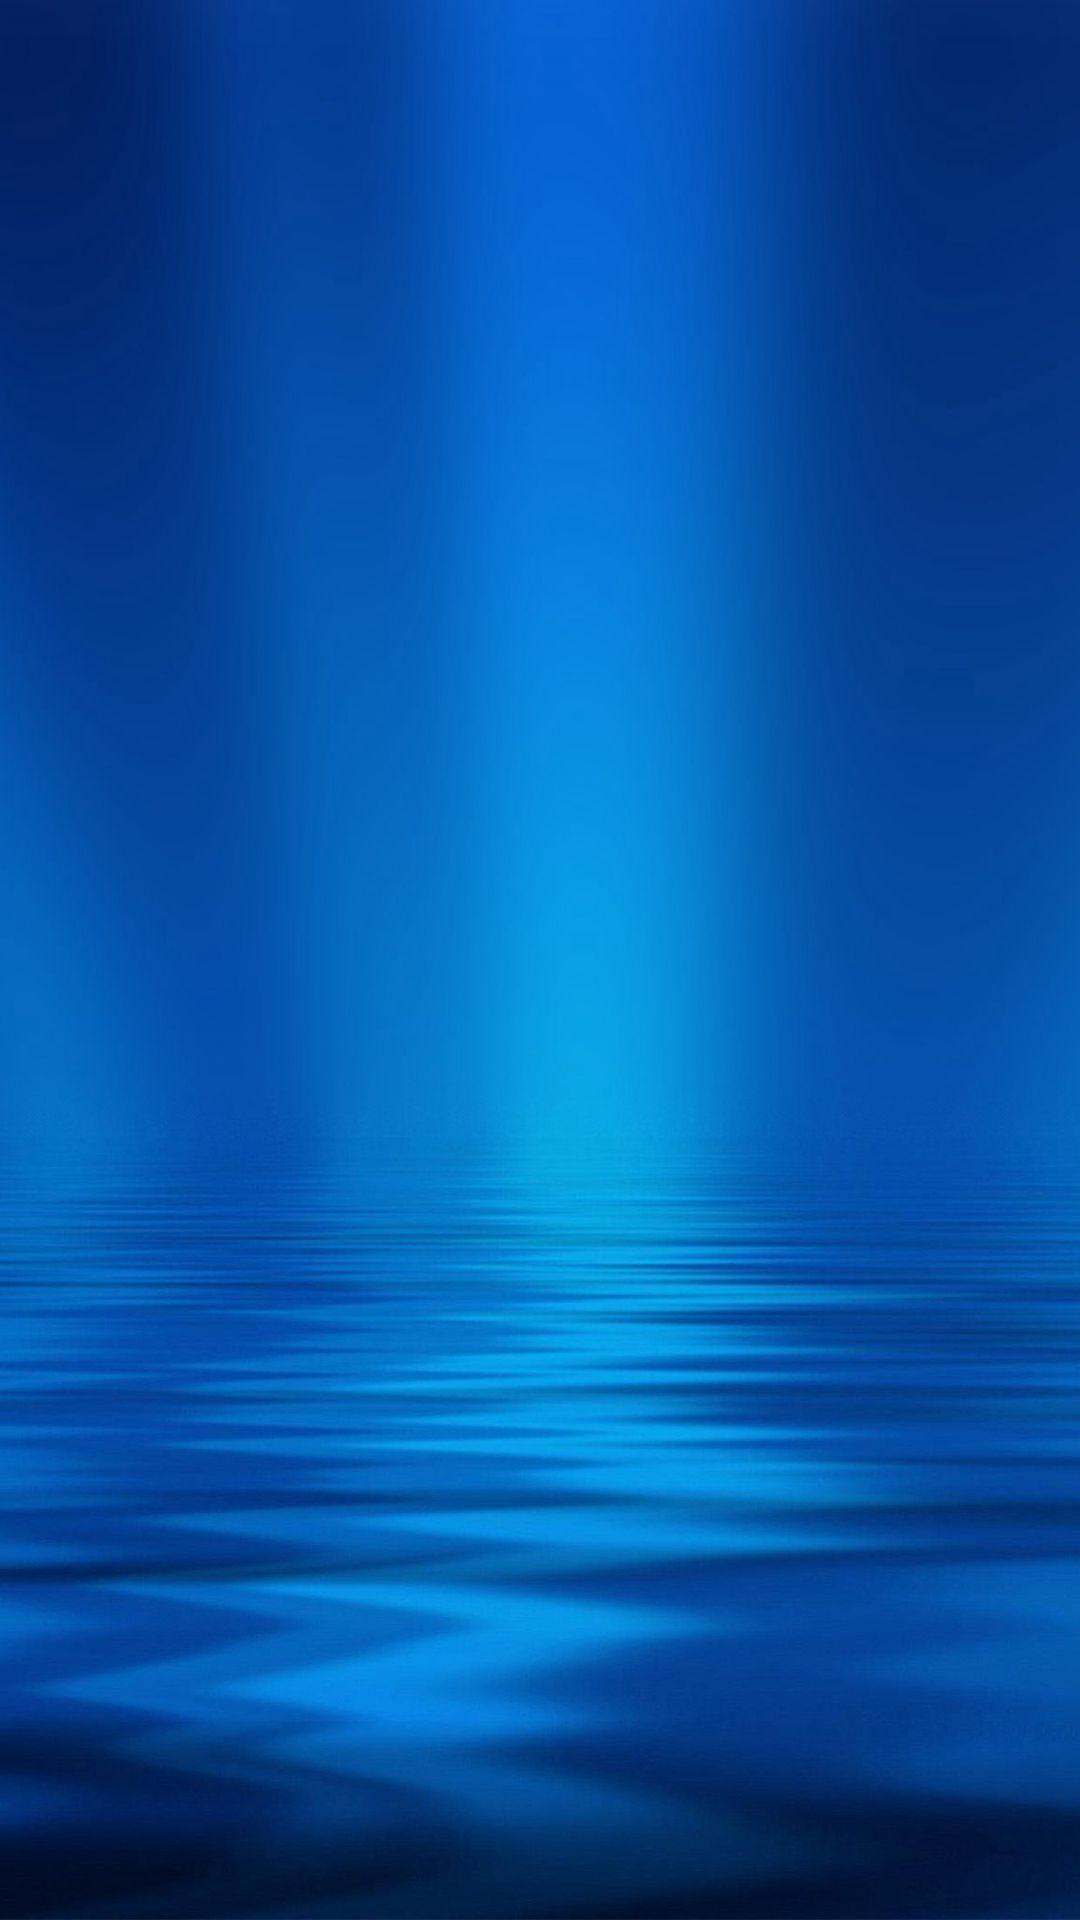 Wallpaper iphone sea - Sea Blue Ripple Pattern Iphone 6 Wallpaper